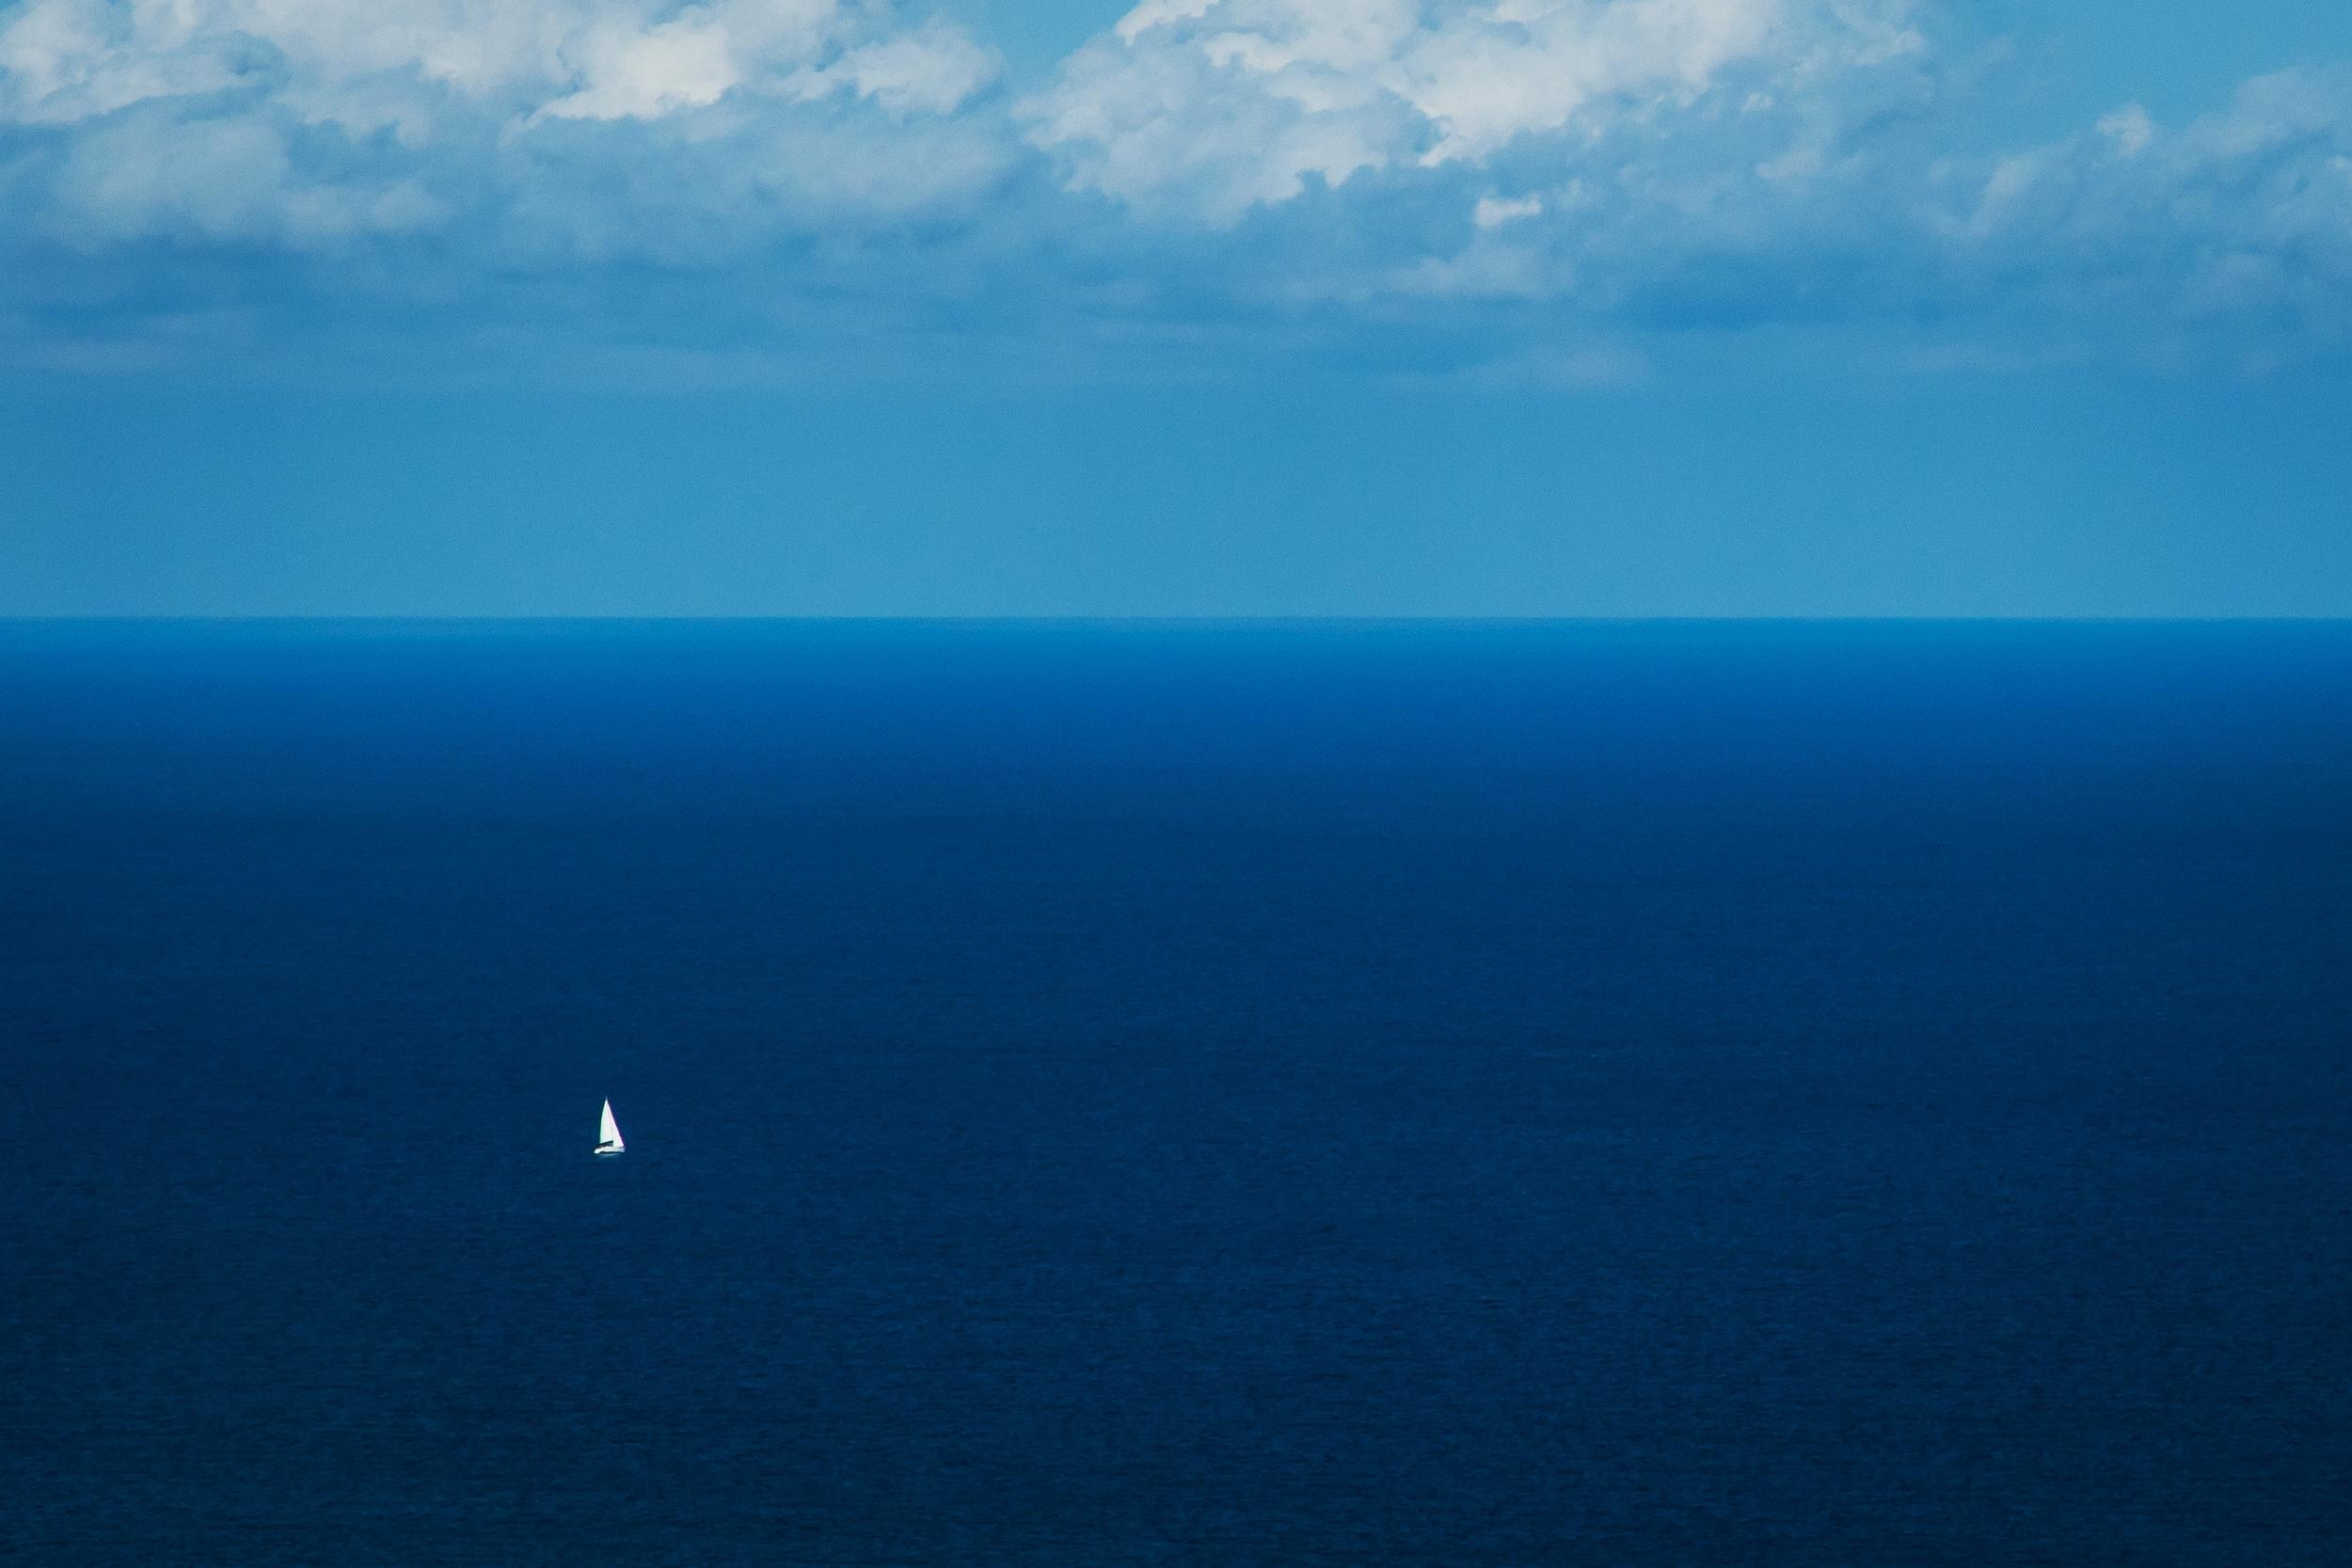 """Columbus Sailed the Ocean Blue in 1492"""